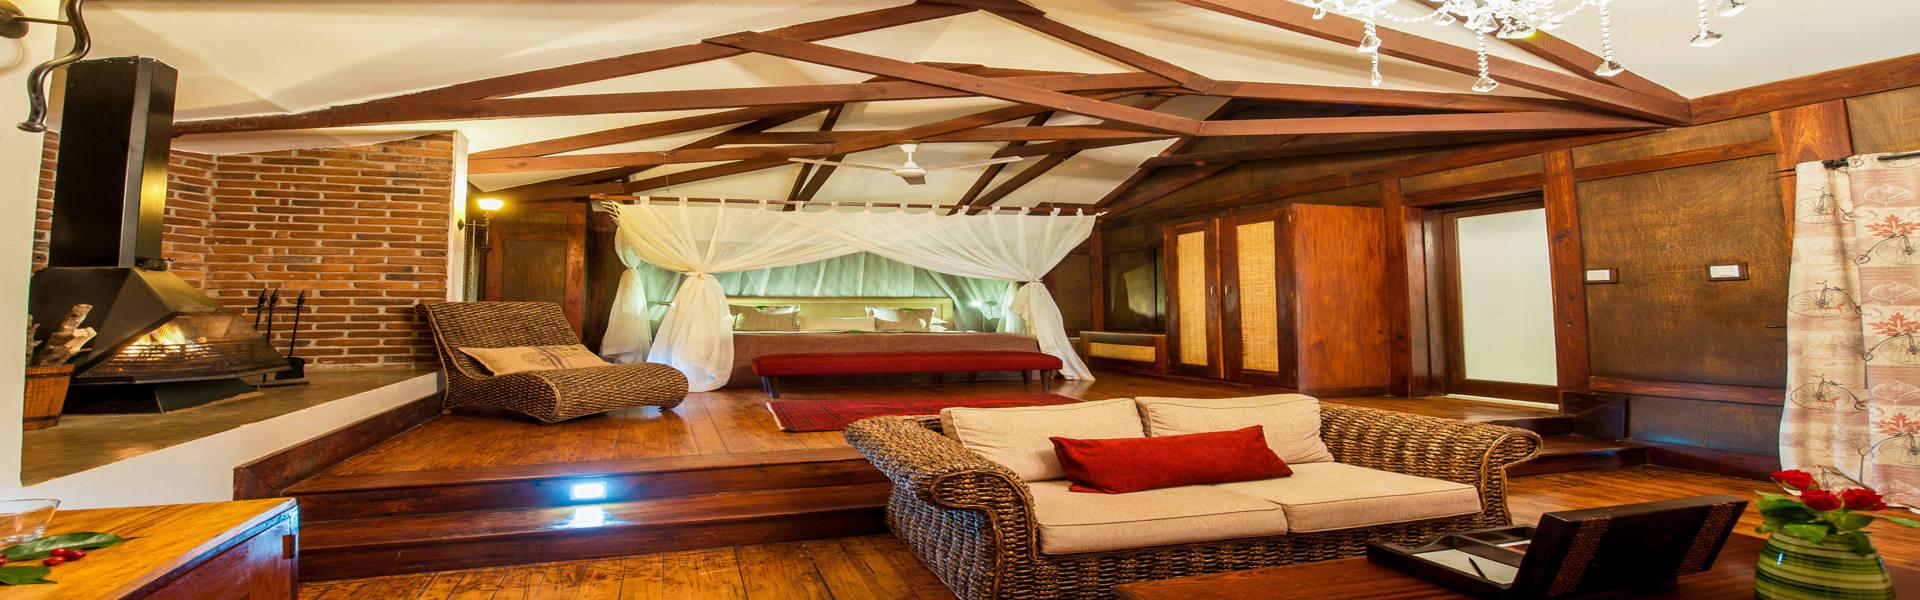 Arusha Coffee Lodge - Plantation Room